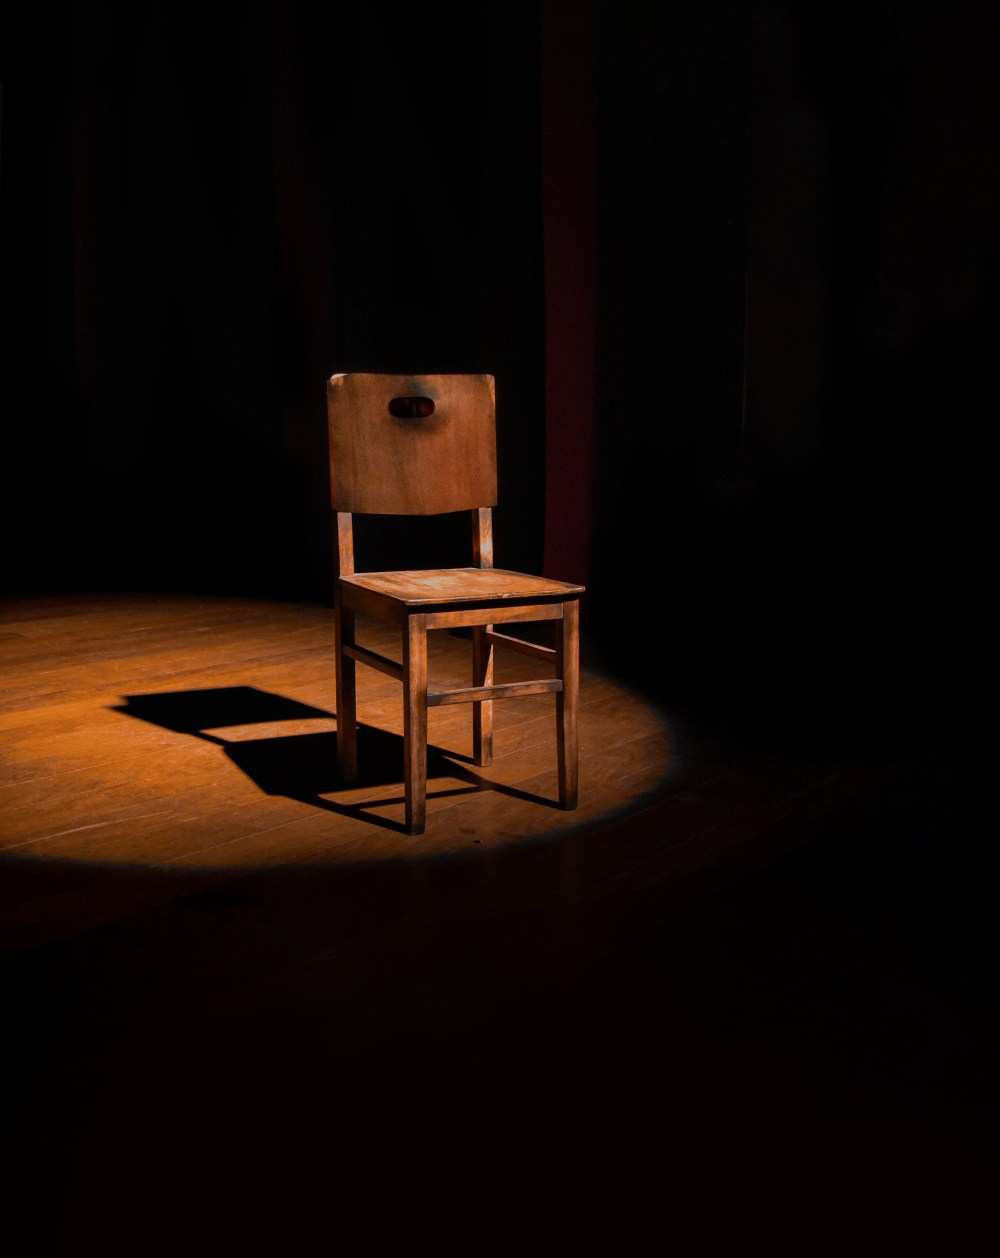 Kursi Foto Studio : kursi, studio, Chair, Pictures, Download, Images, Unsplash